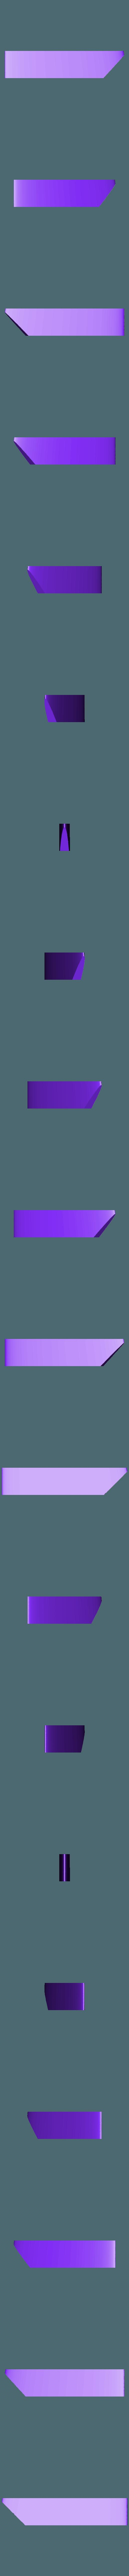 Stabilizer_Cavity_Tool.stl Download free STL file Flyer Mk. 1 • 3D printing object, billbo1958